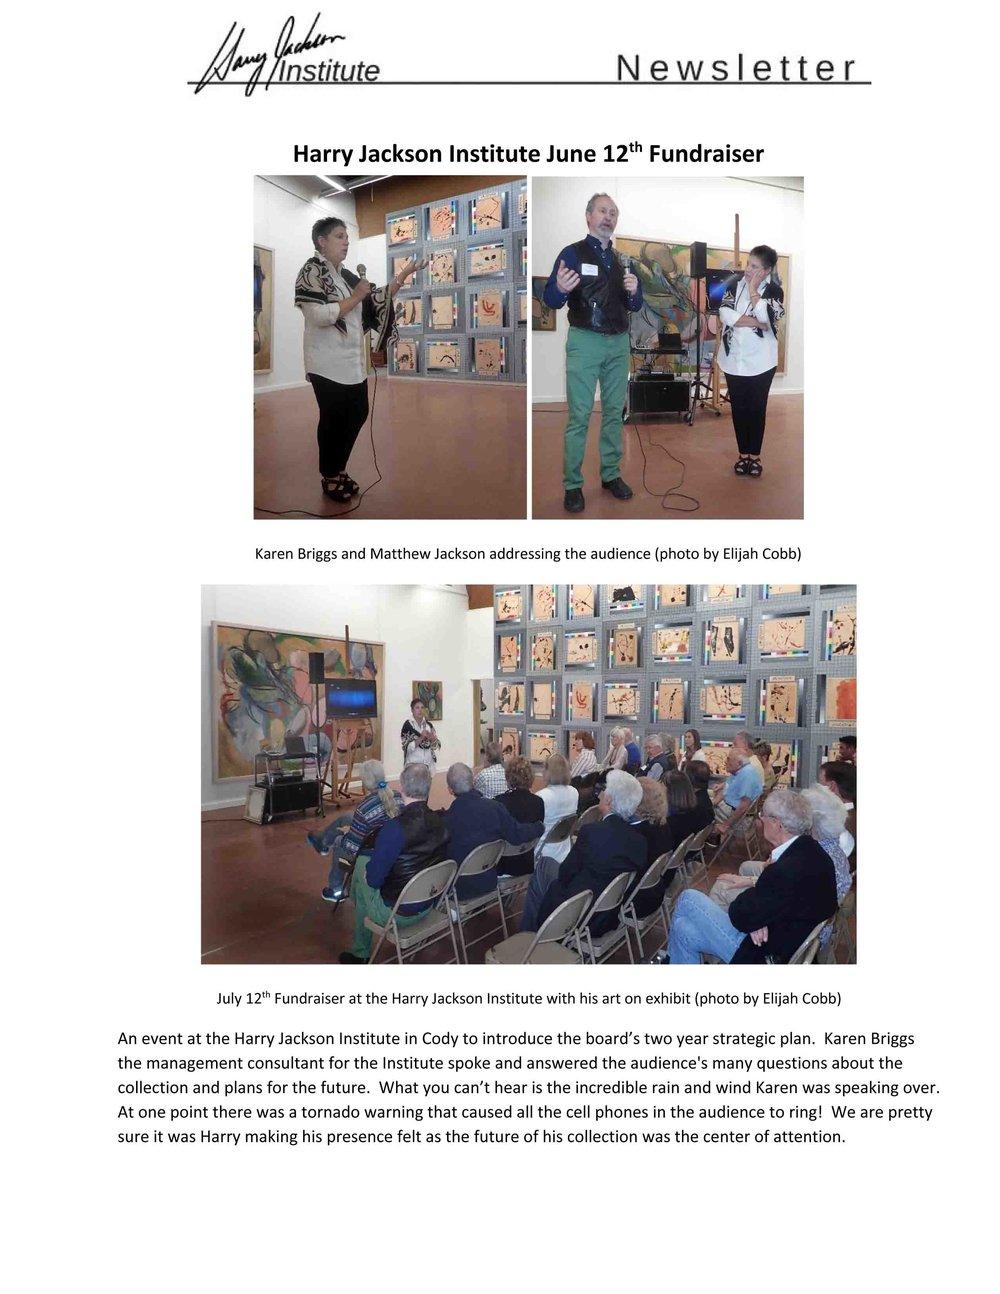 2017_10_01 Harry Jackson Iinstitute Newsletter-7.jpg